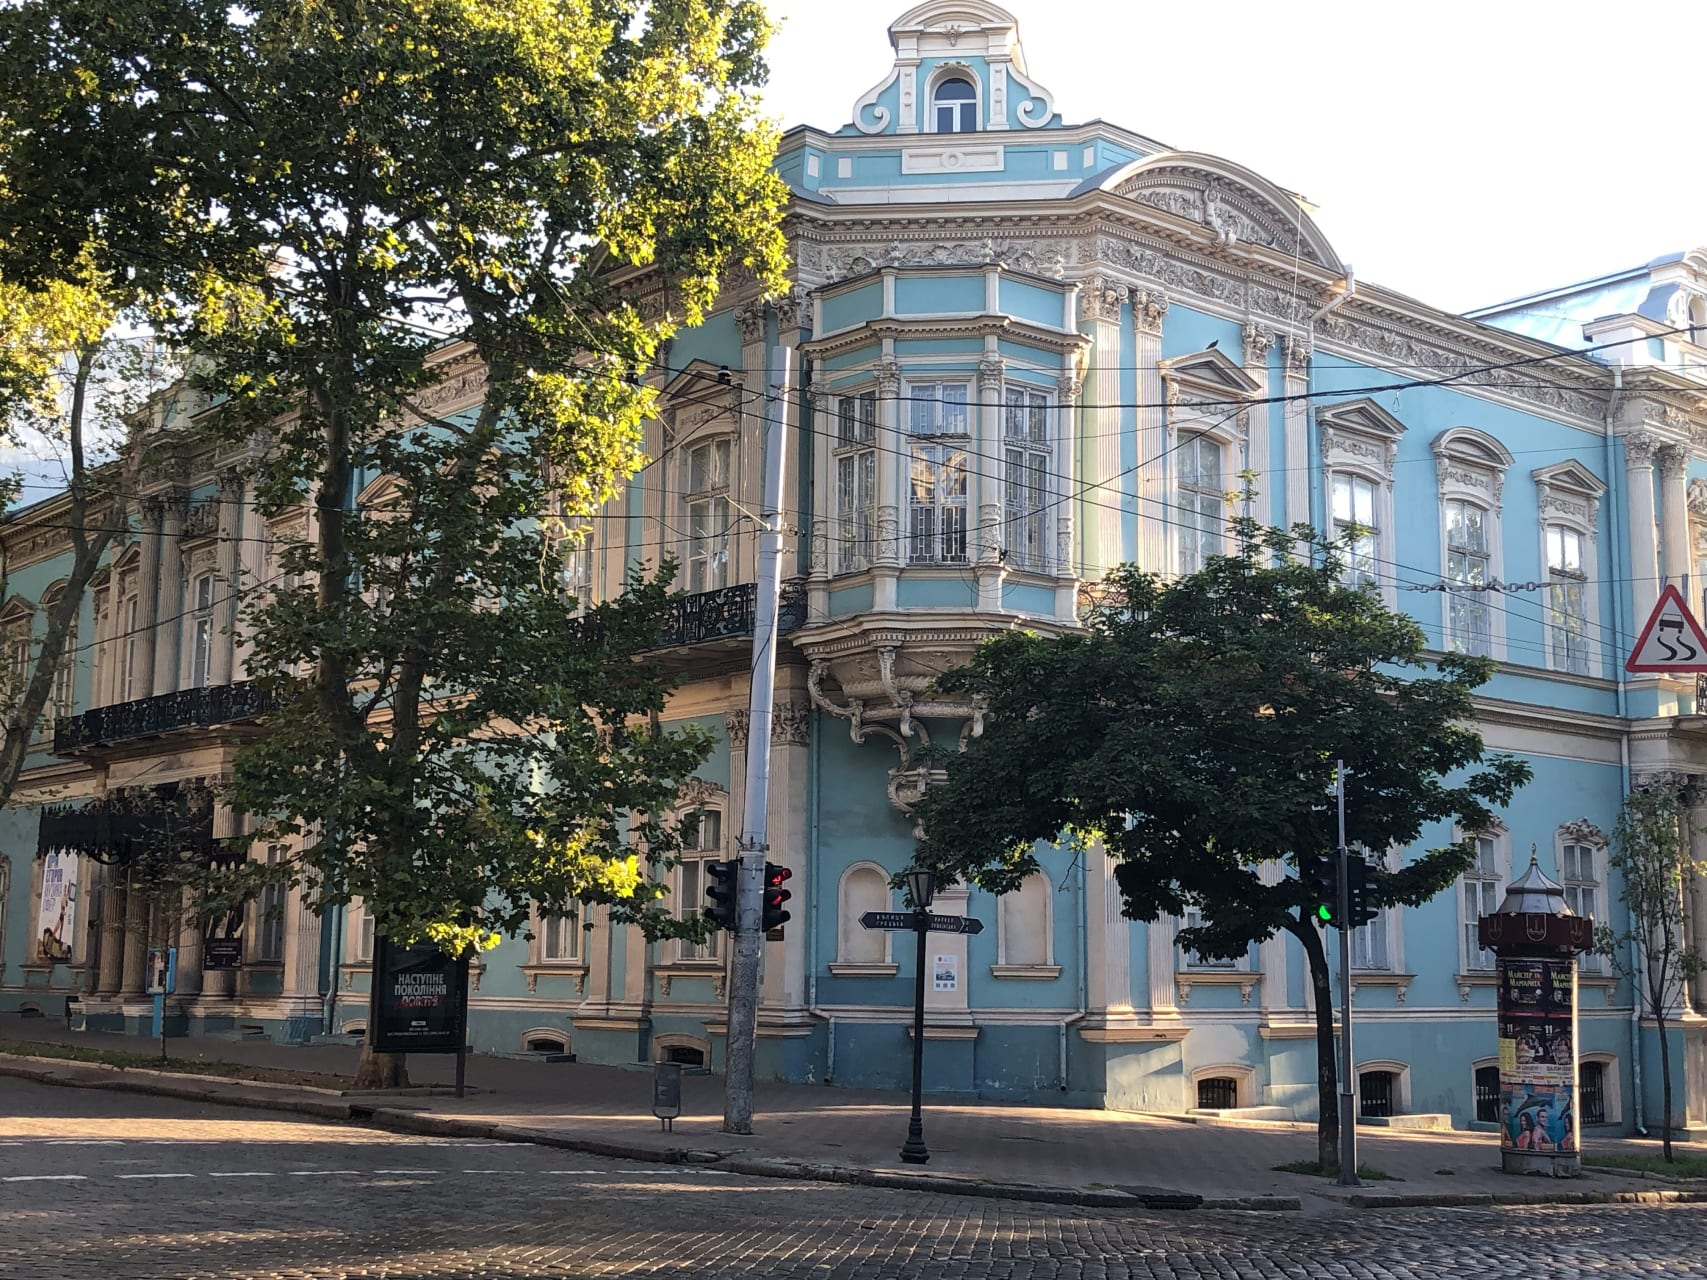 Odessa -  Jewish Odessa Tour Part 1: The City of Dreams